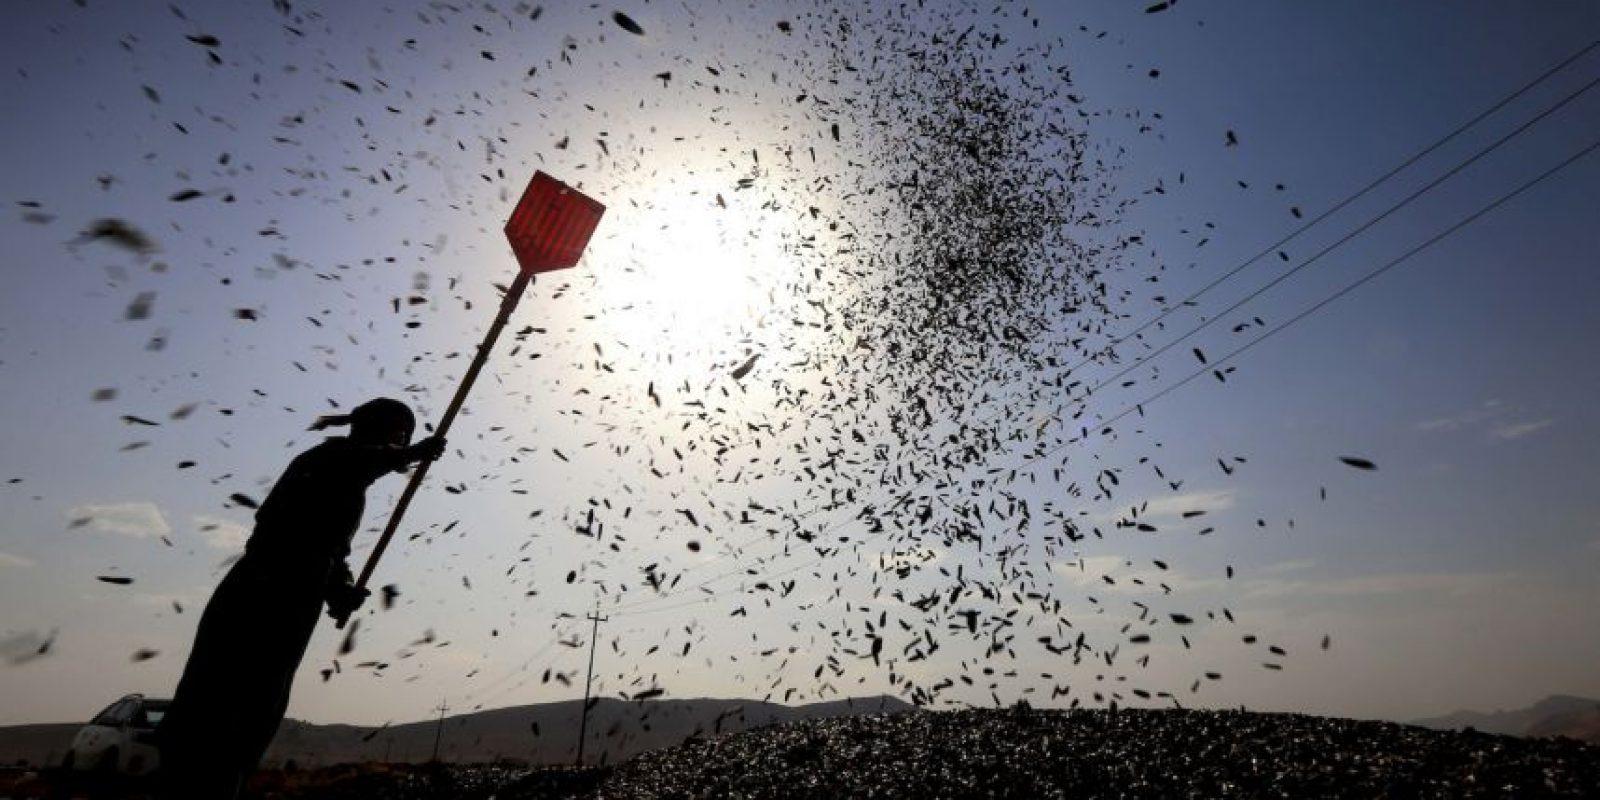 Un hombre kurdo cosecha girasoles al norte de Irak. Foto:AFP